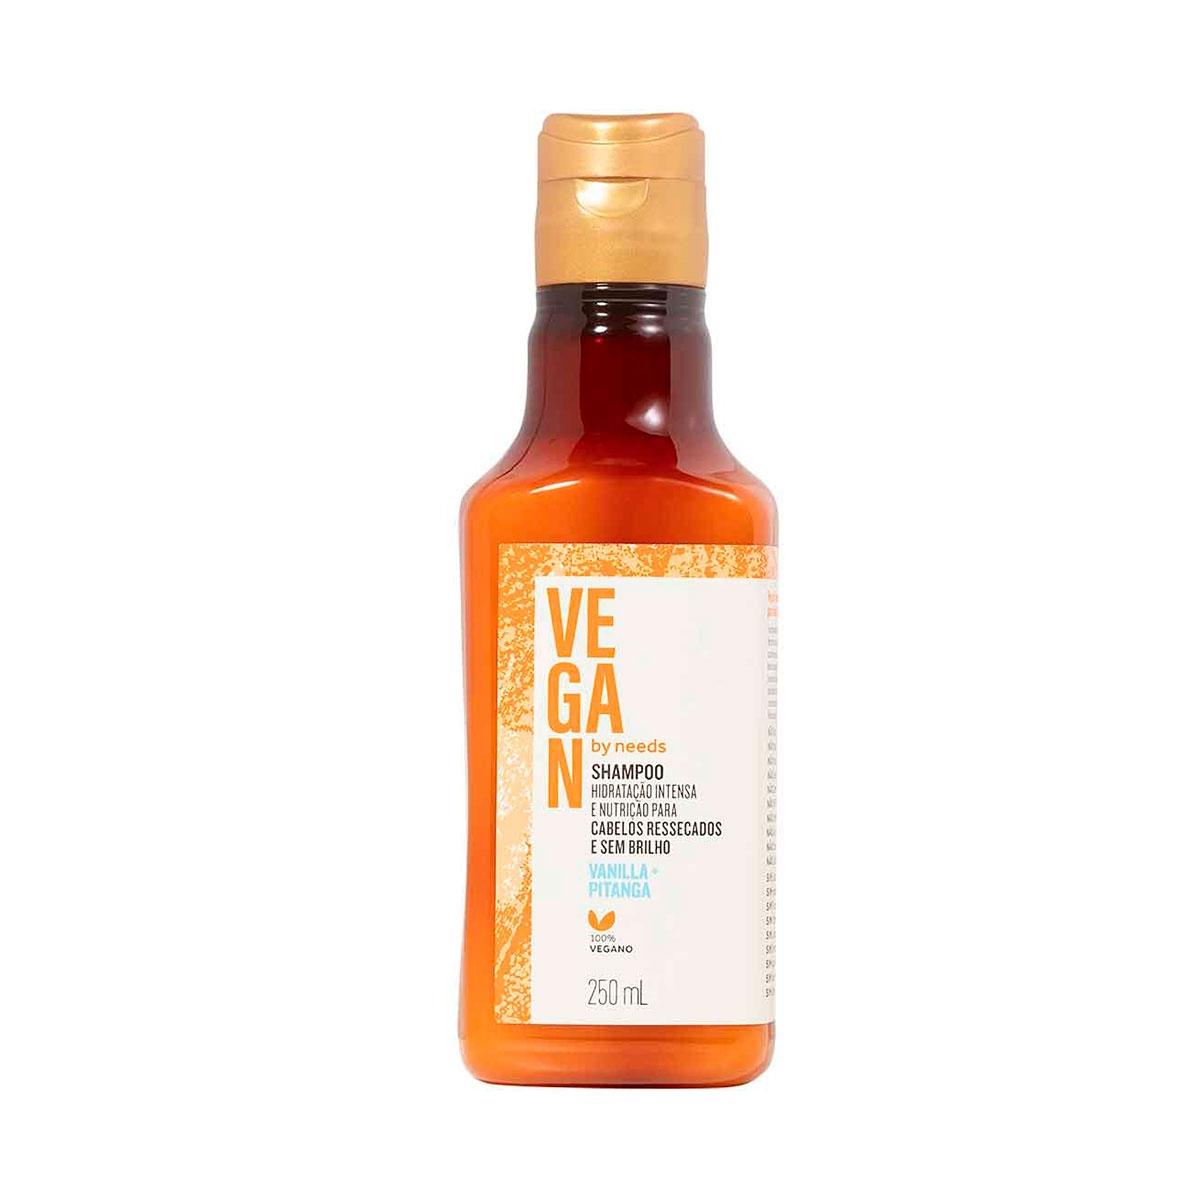 Shampoo Vegan by Needs Cabelos Ressecados Vanilla + Pitanga 250ml